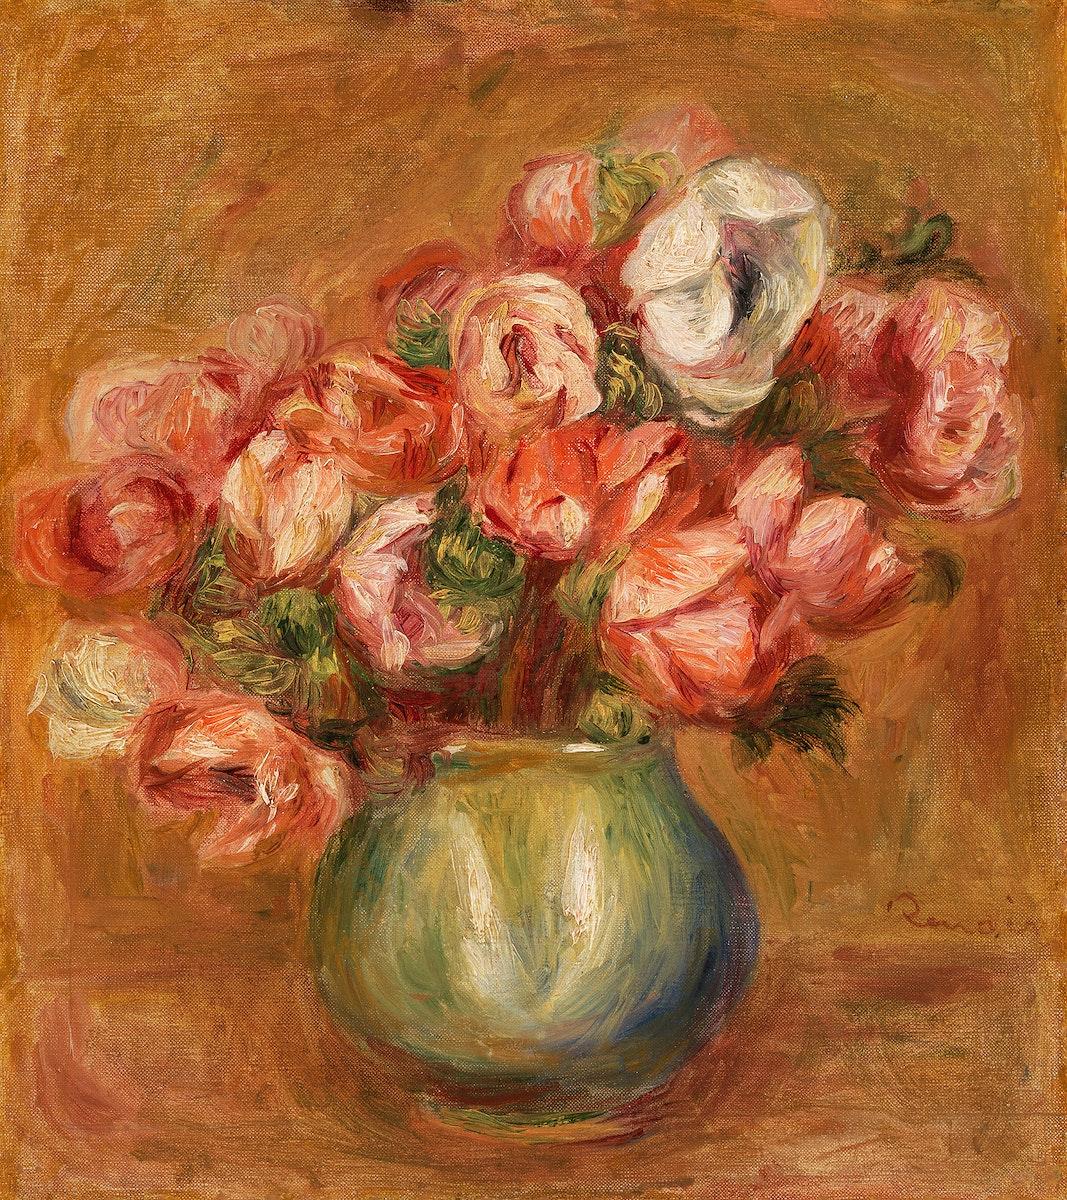 Anemones (Anémones) (1907) by Pierre-Auguste Renoir. Original from Barnes Foundation. Digitally enhanced by rawpixel.